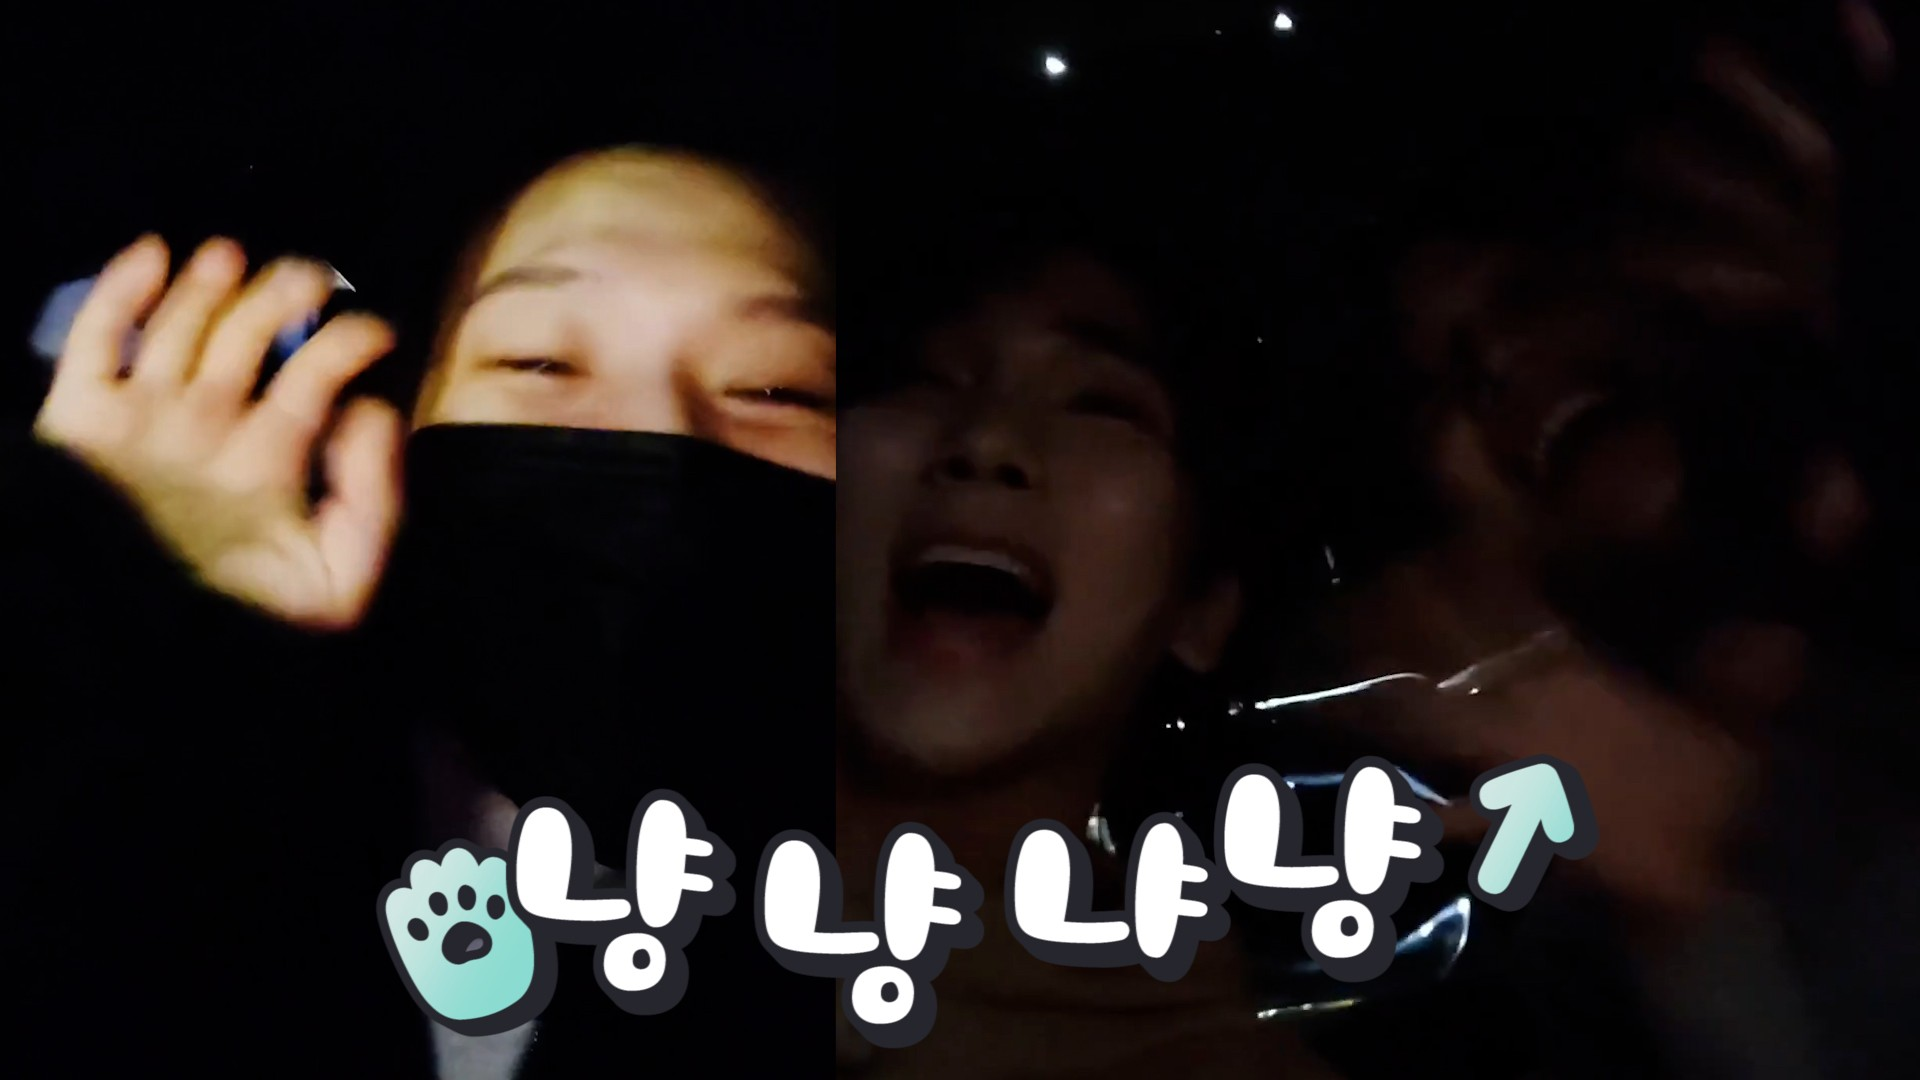 [SHINee] 샤이니 좋아서 여기가 천국인지 지상인지 도코데스카🎶🐾 (SHINee singing a Japanese children's song)